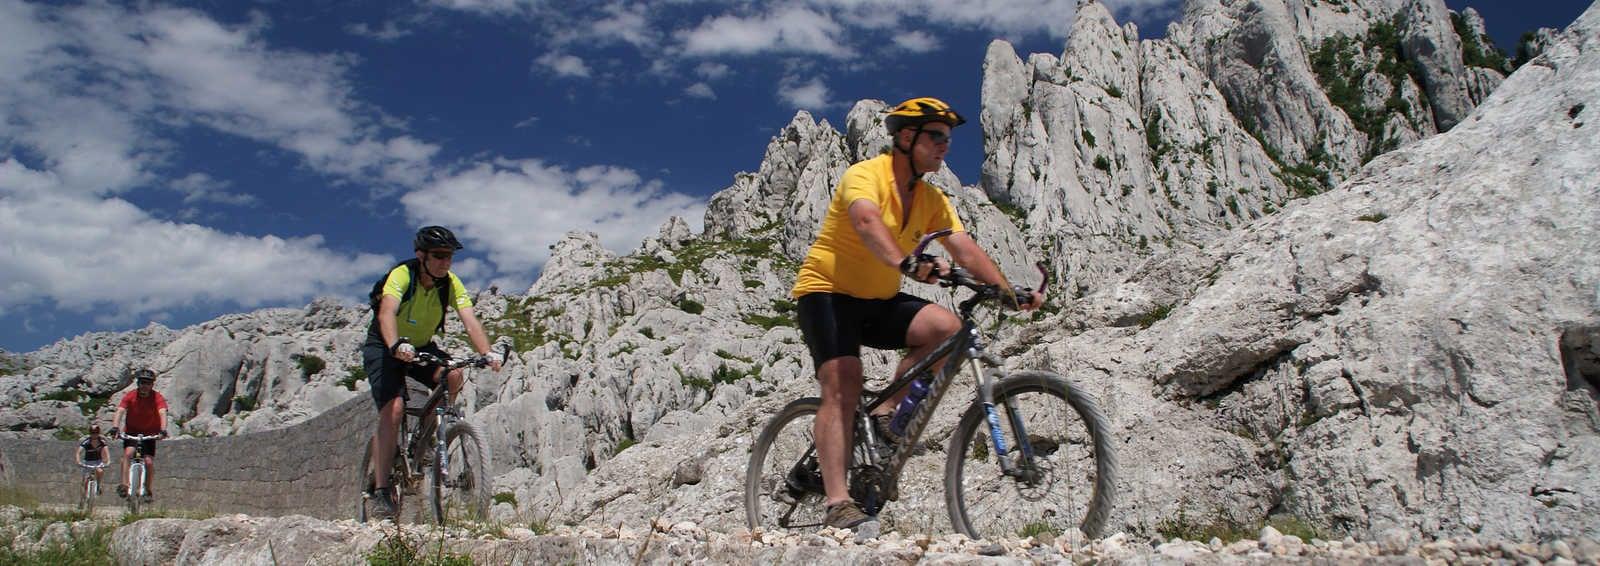 Mali Halan pass summit, Croatia